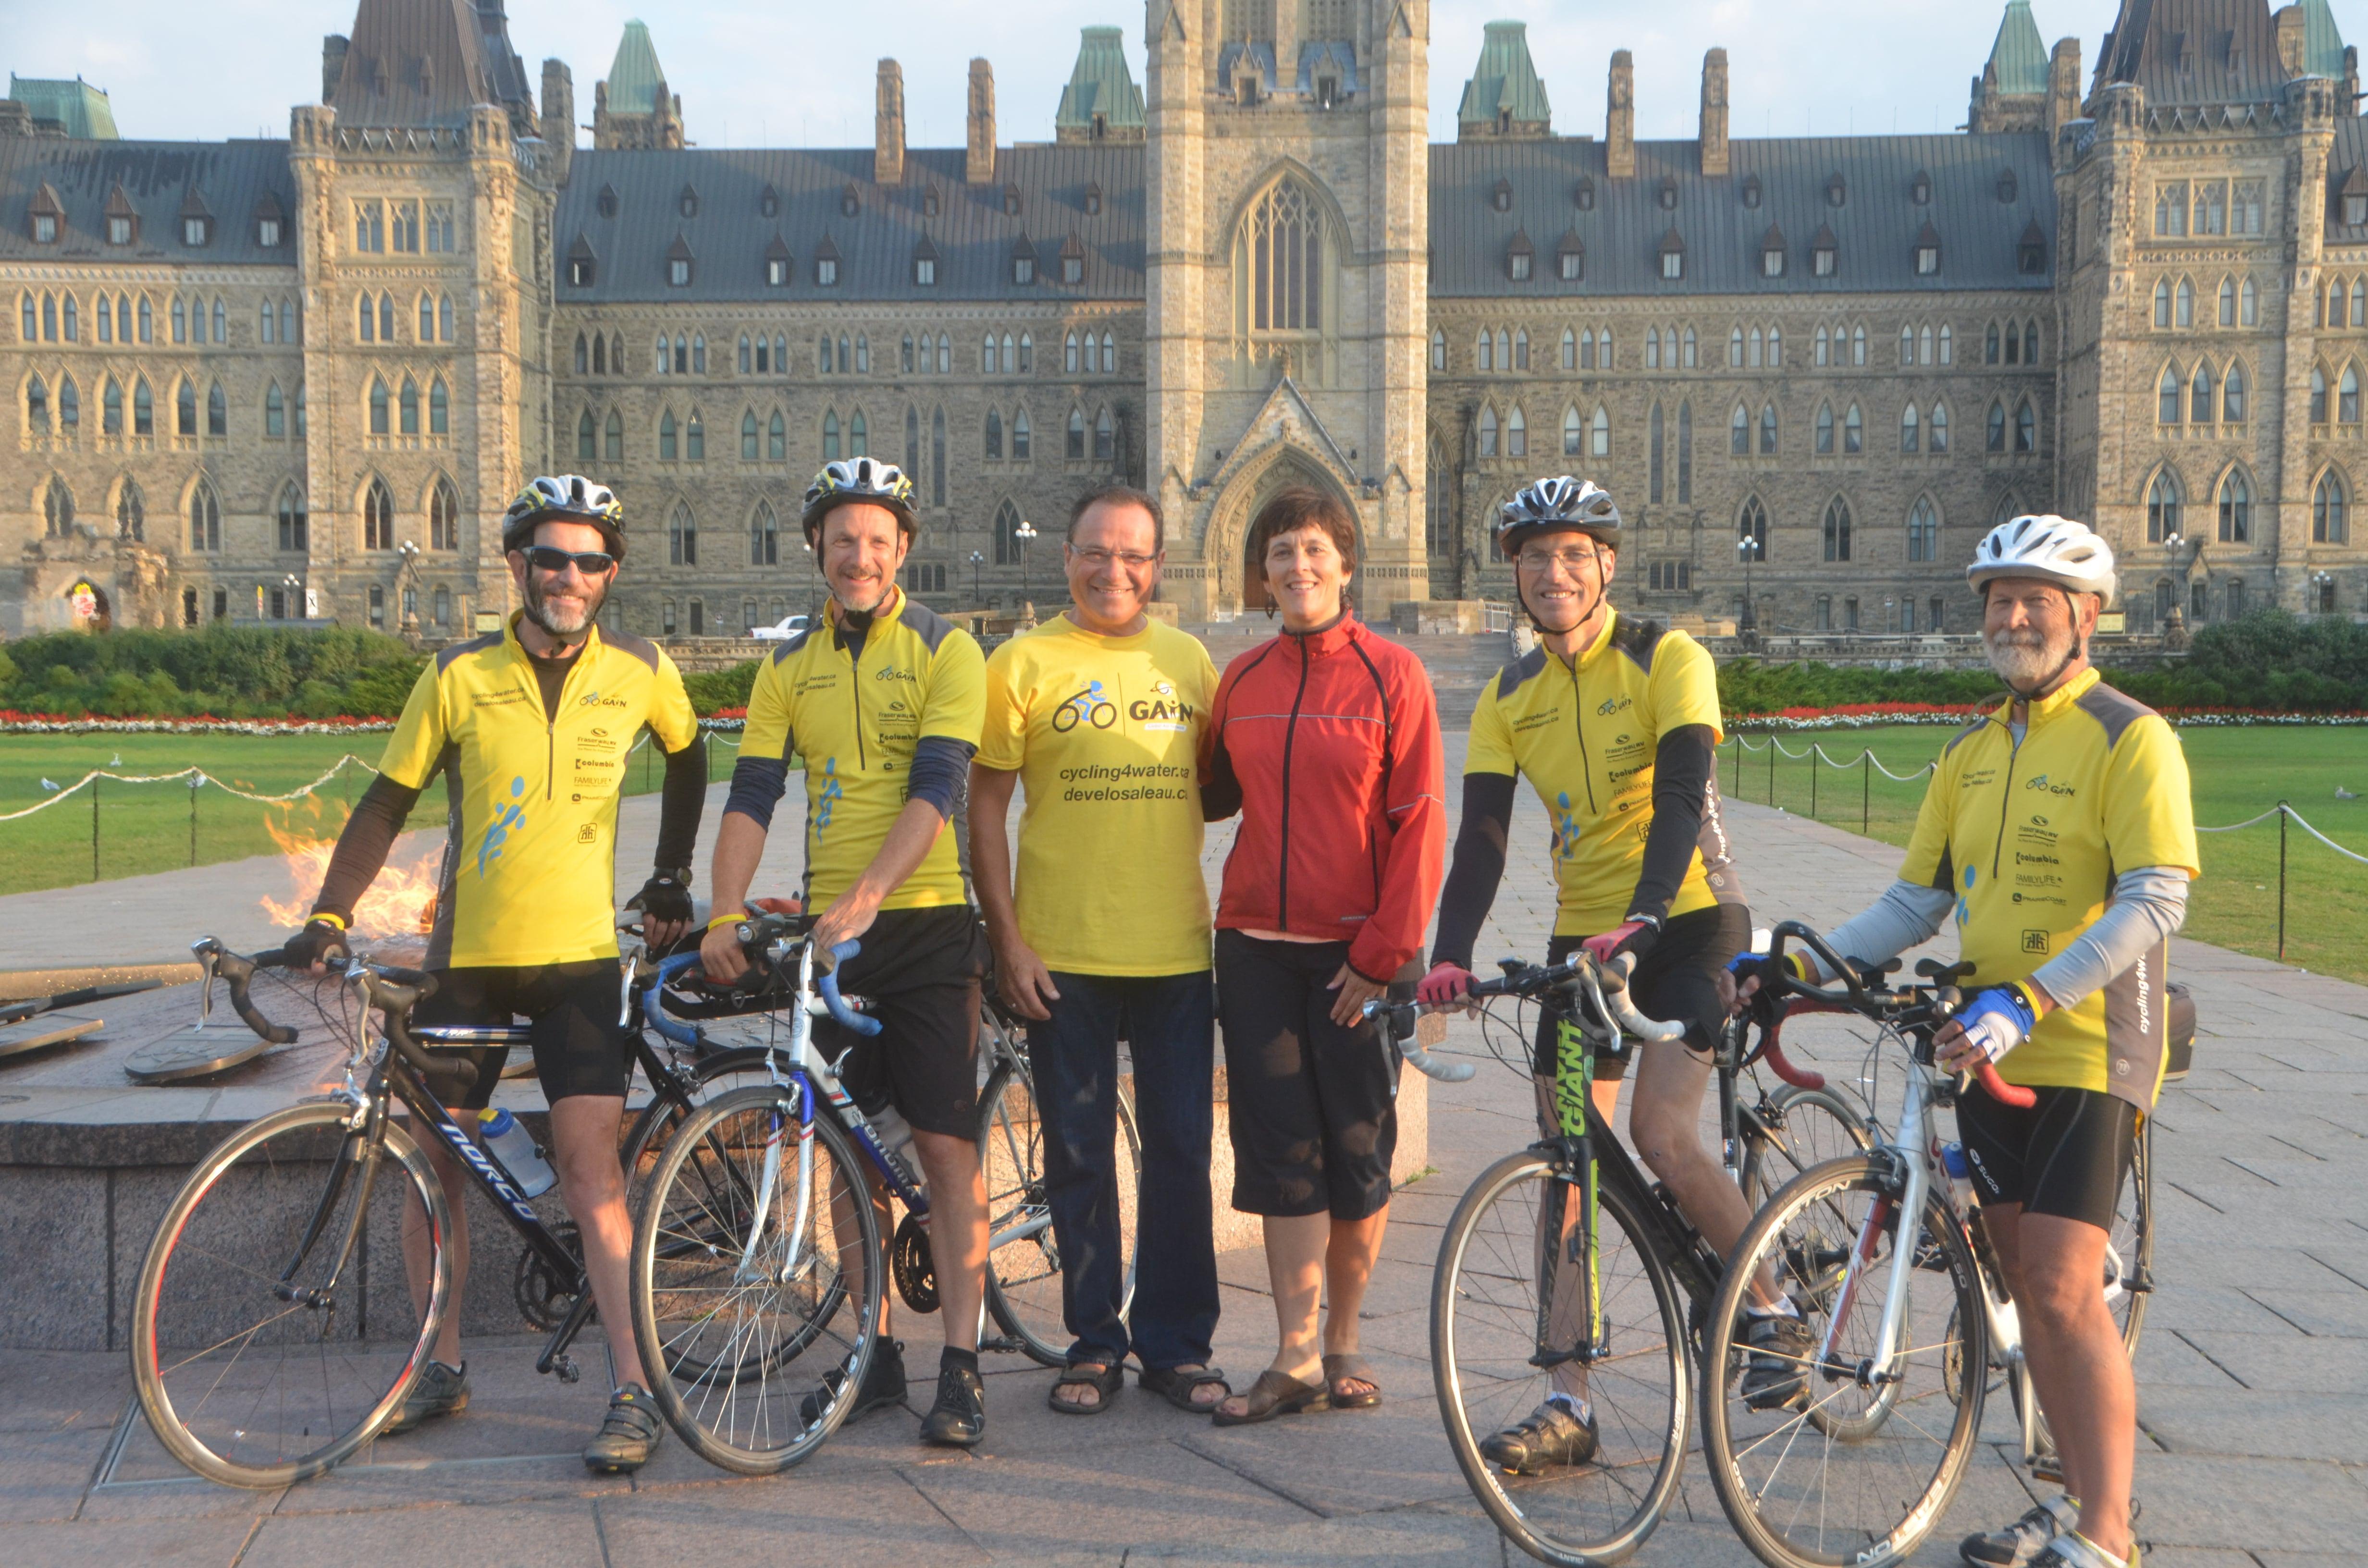 Day 35: Ottawa to Montreal 198 km